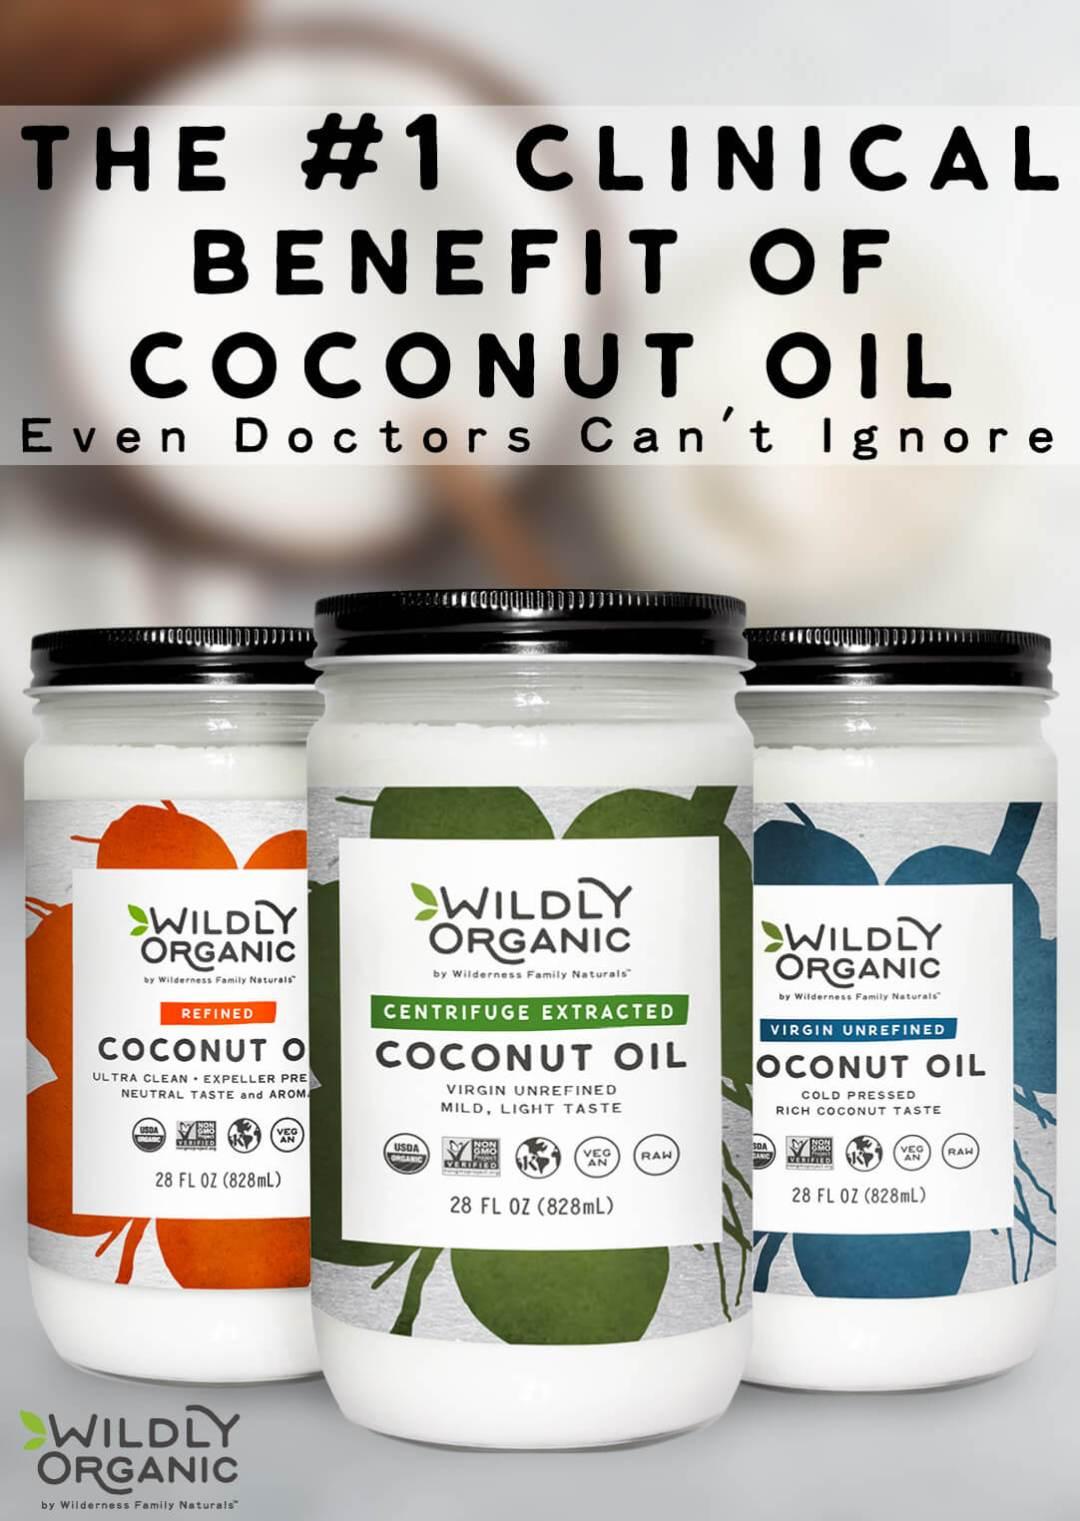 Wilderness Family Naturals Organic Coconut Oil